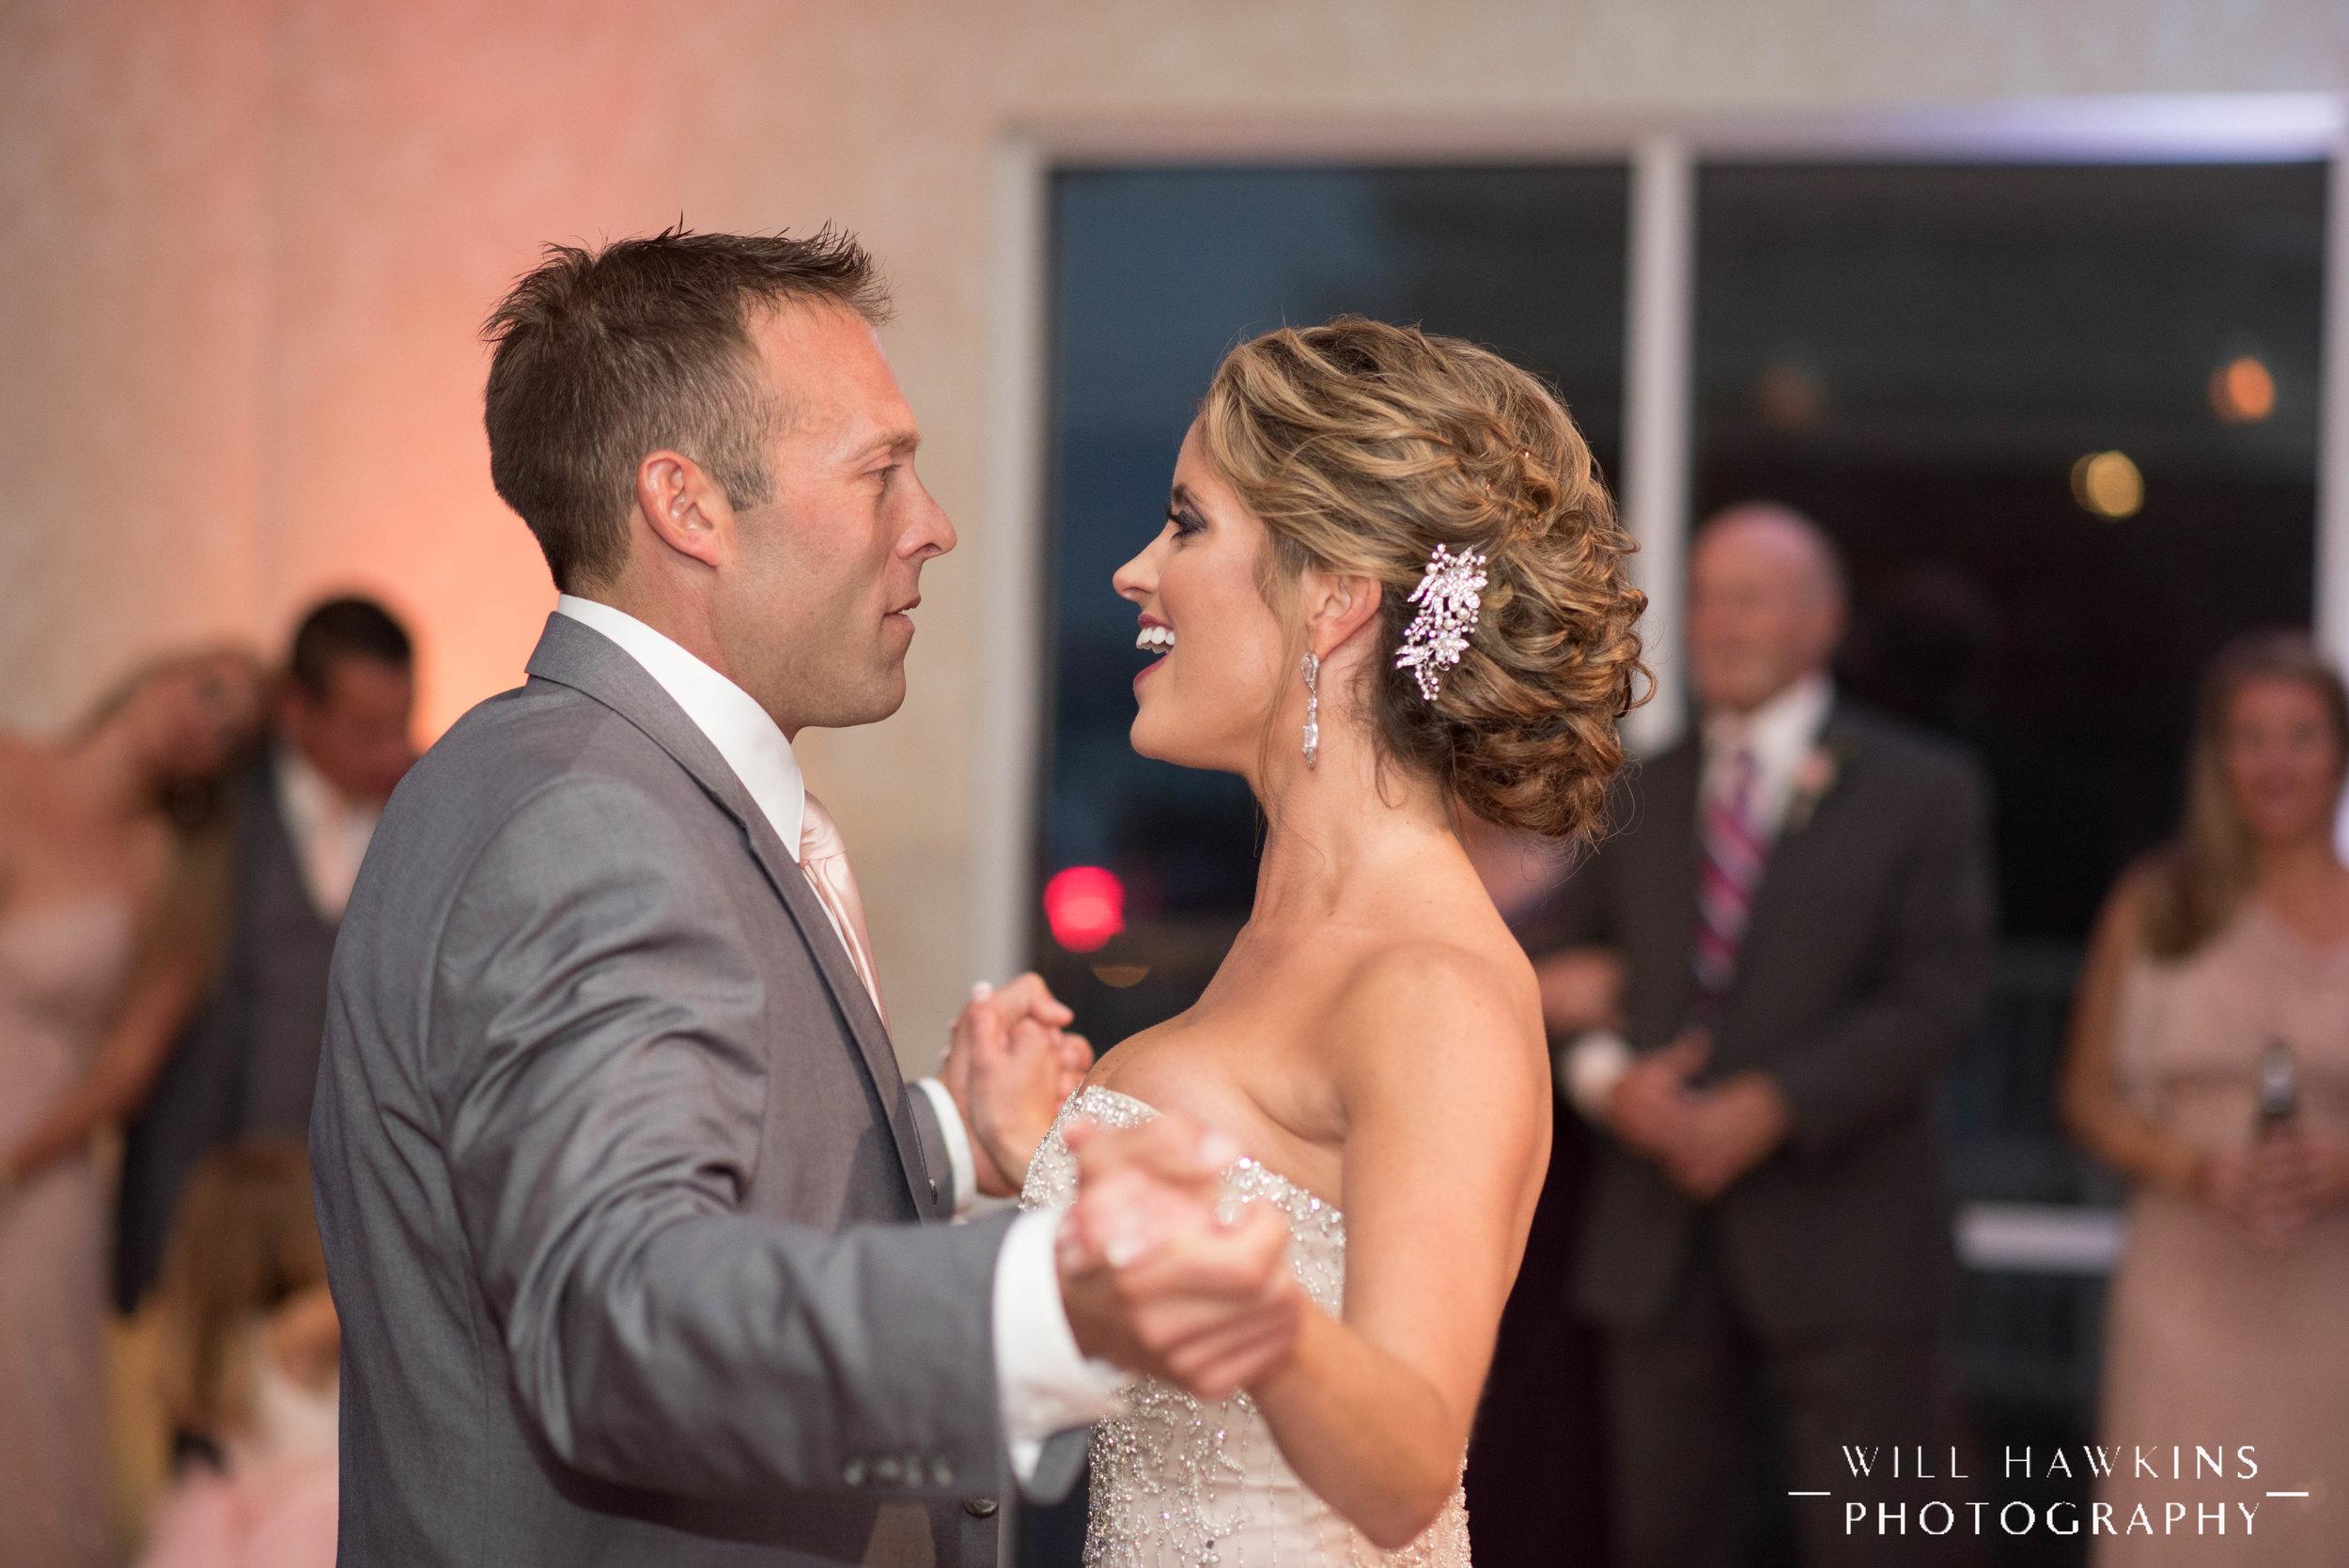 Will Hawkins Photography, Virginia Wedding Photographer, Virginia Beach Wedding Photographer, Destination Wedding Photographer